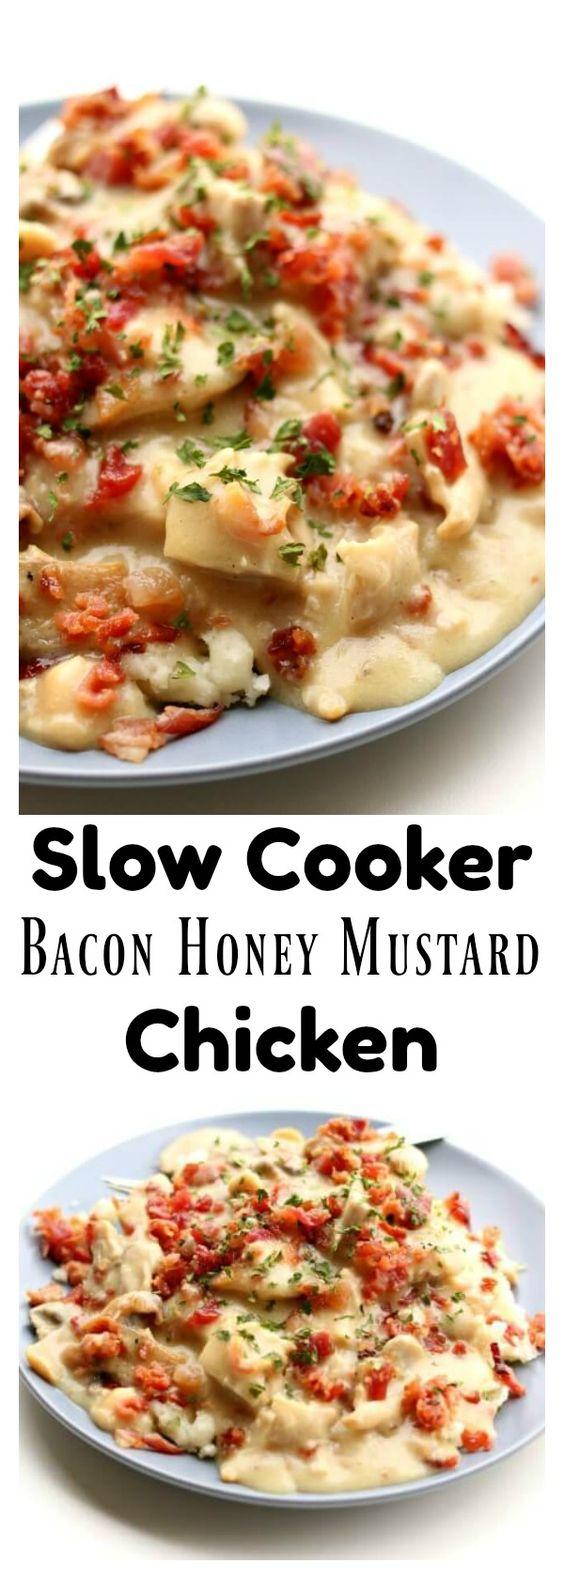 Slow Cooker Bacon Honey Mustard Chicken